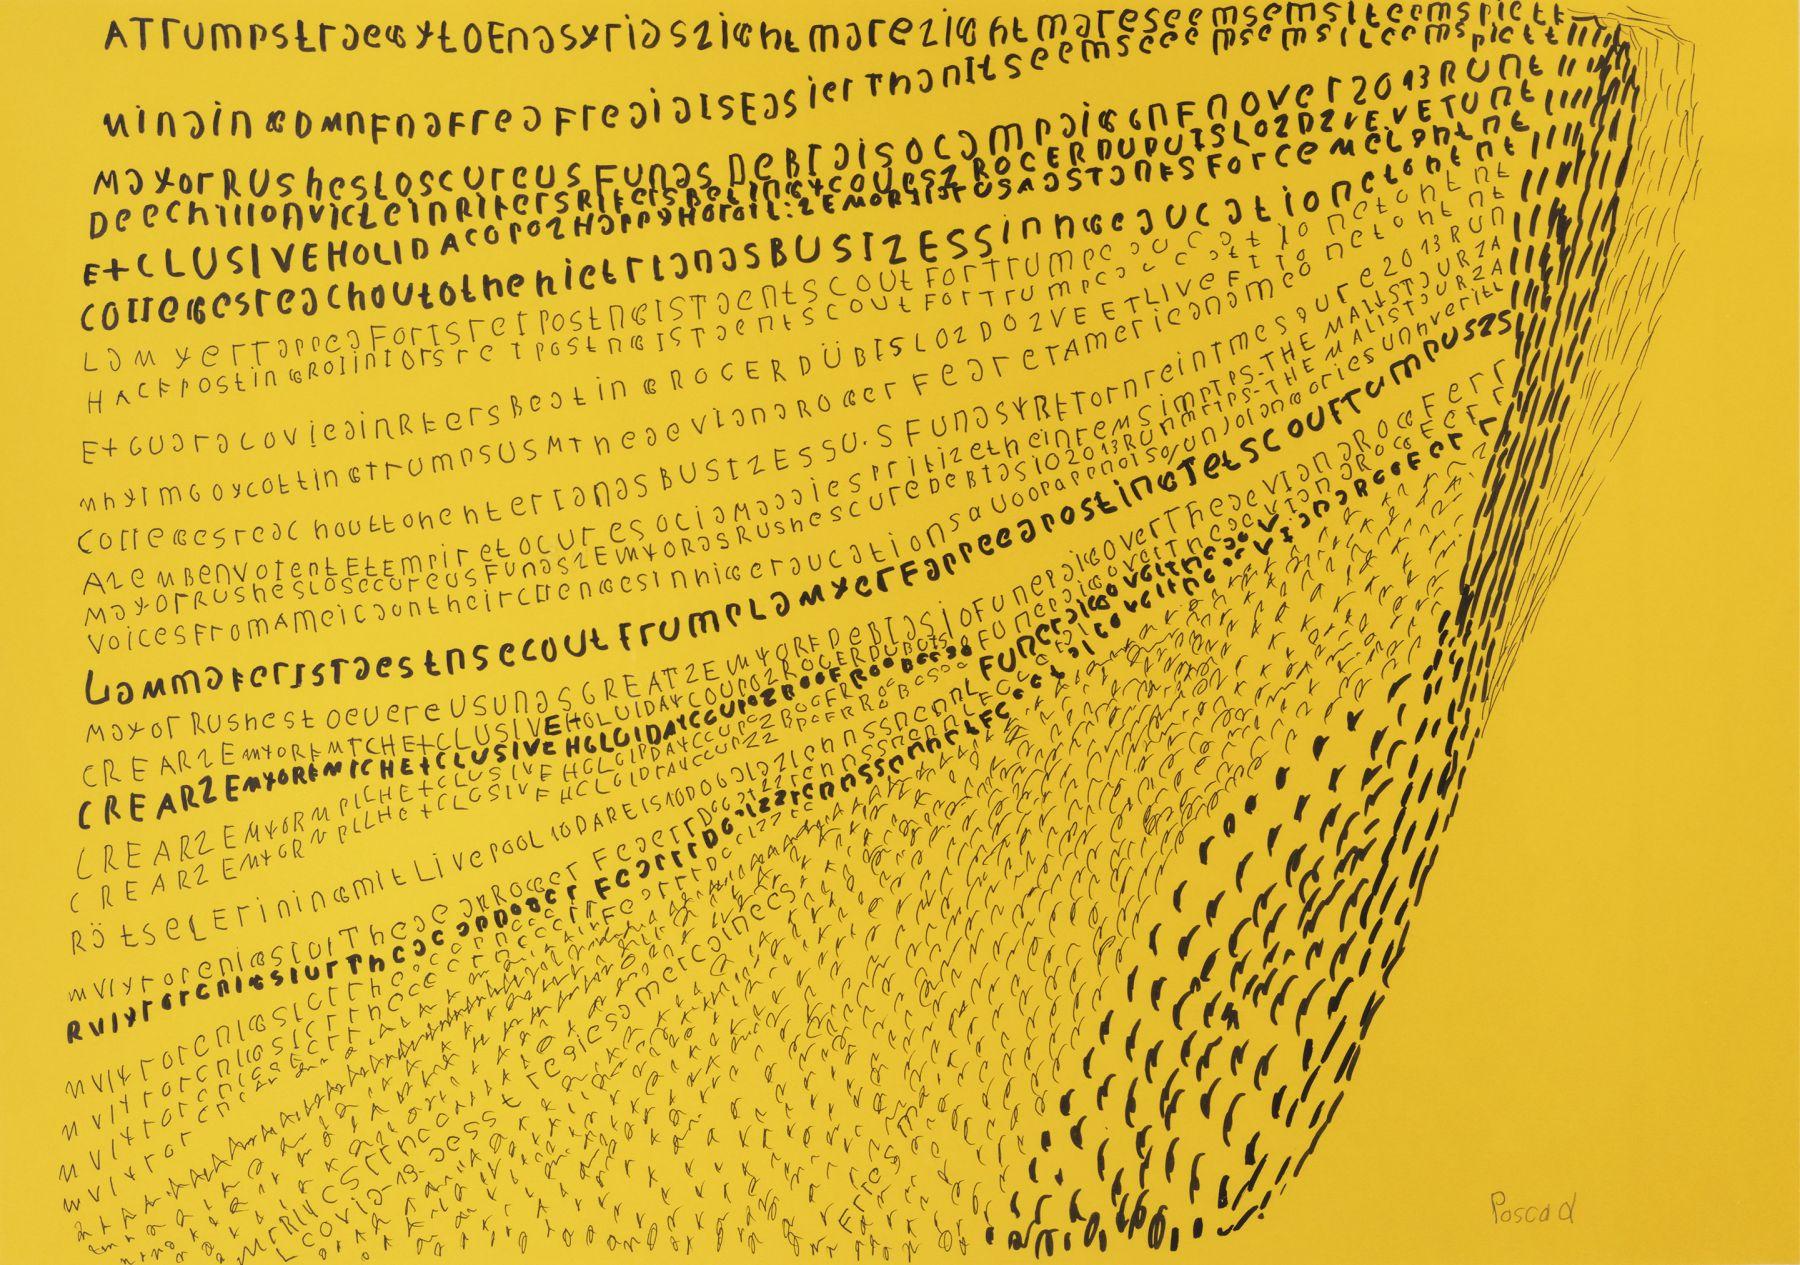 Pascal Vonlanthen  ATrump, 2020  Felt tip pen and acrylic markers on yellow paper  45 x 64 cm